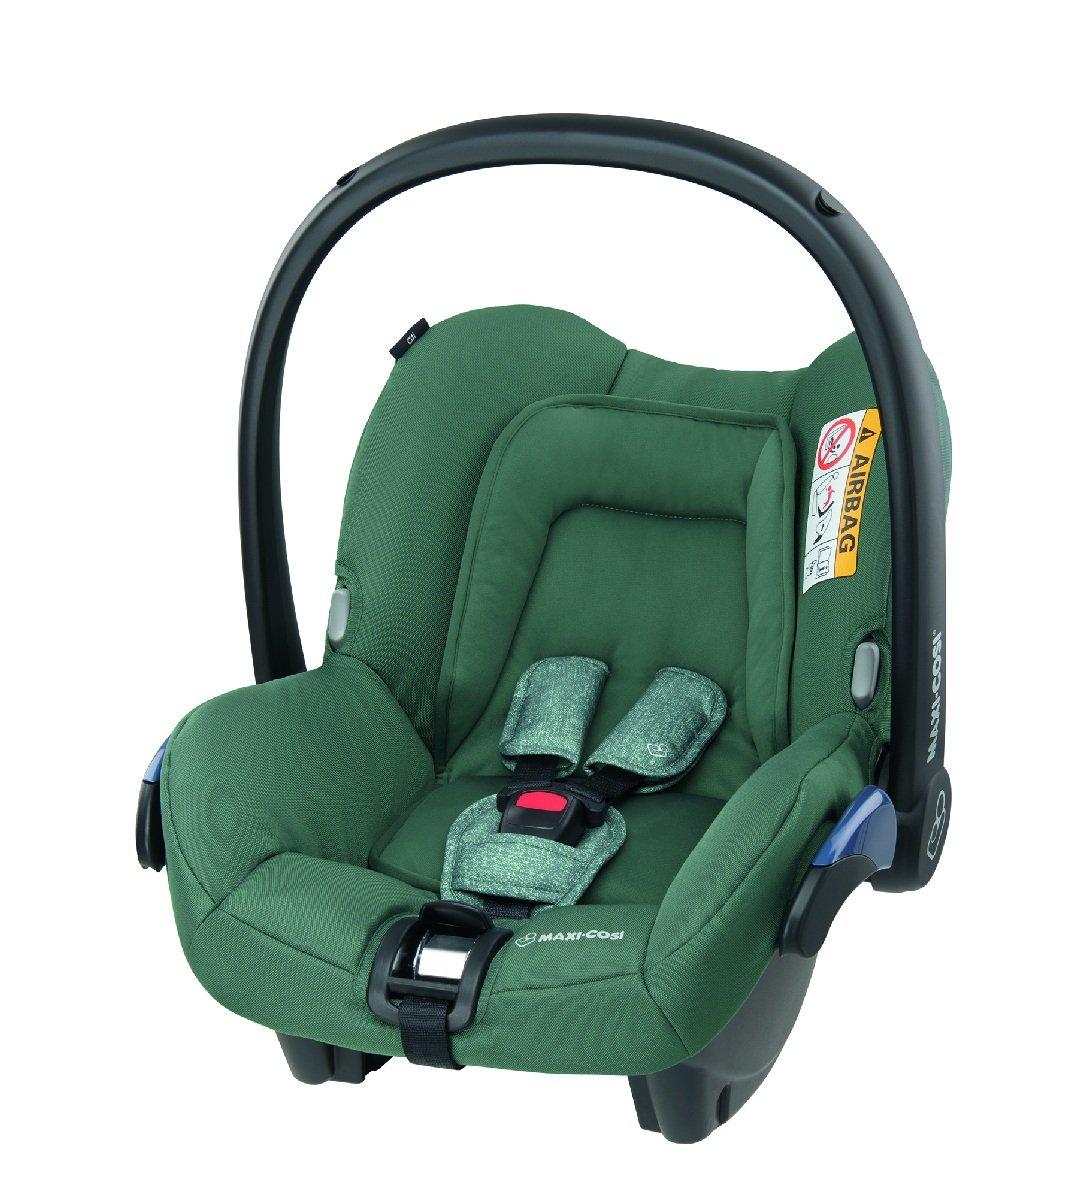 maxi cosi citi fotelik samochodowy 0 13 kg nomad green maxi cosi sklep empik com. Black Bedroom Furniture Sets. Home Design Ideas